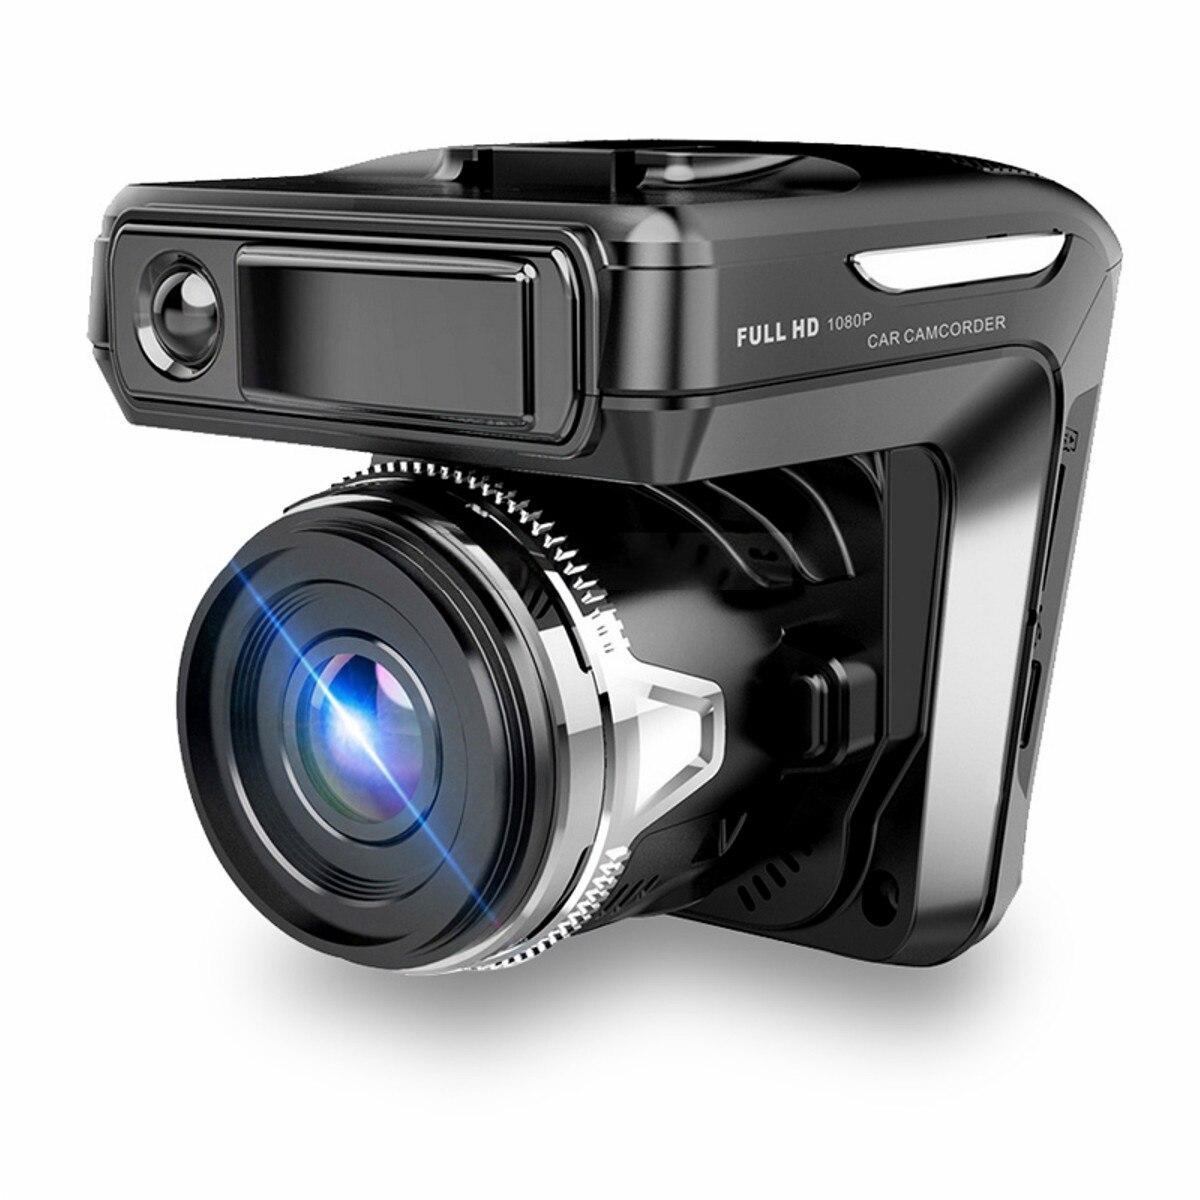 KROAK 2.4'' 3 In 1 Car DVR Camera Anti Radar Detector Laser HD 720P Built-in GPS Logger Alarm System Digital Video Recorder gps навигатор lexand sa5 hd